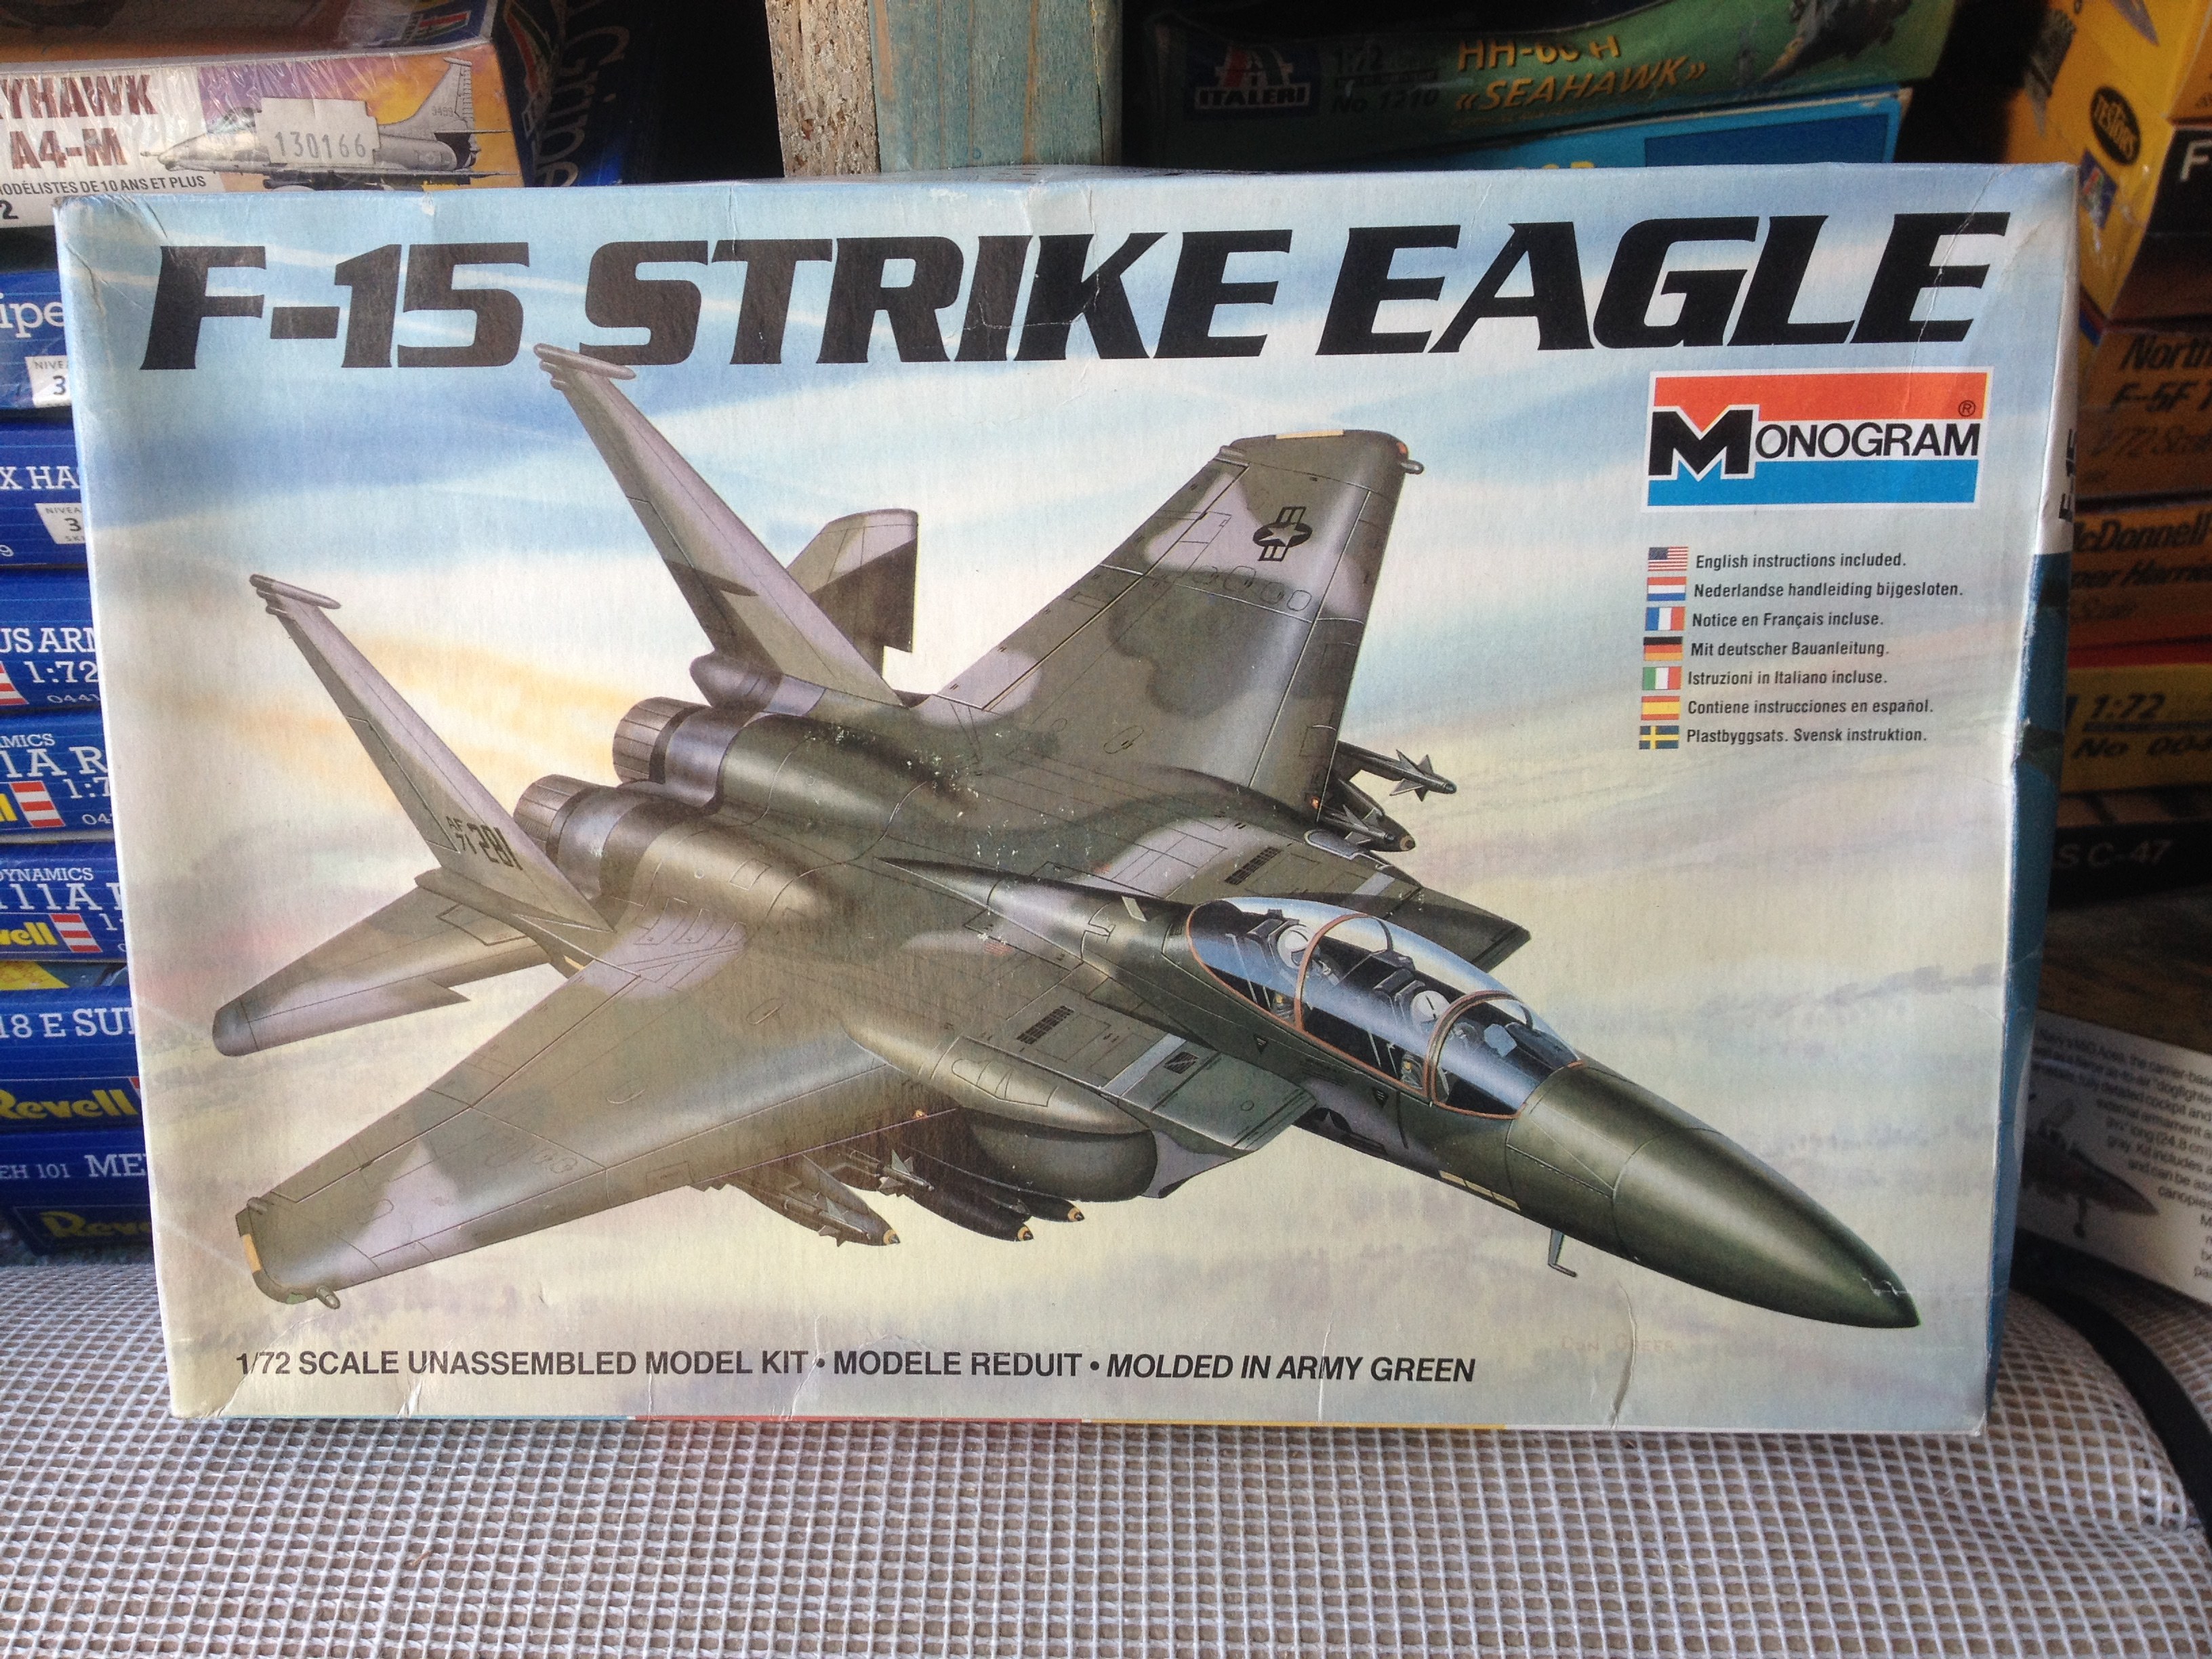 F-15 Strike Eagle US Air Force - Monogram 1/72nd scale plastic kit